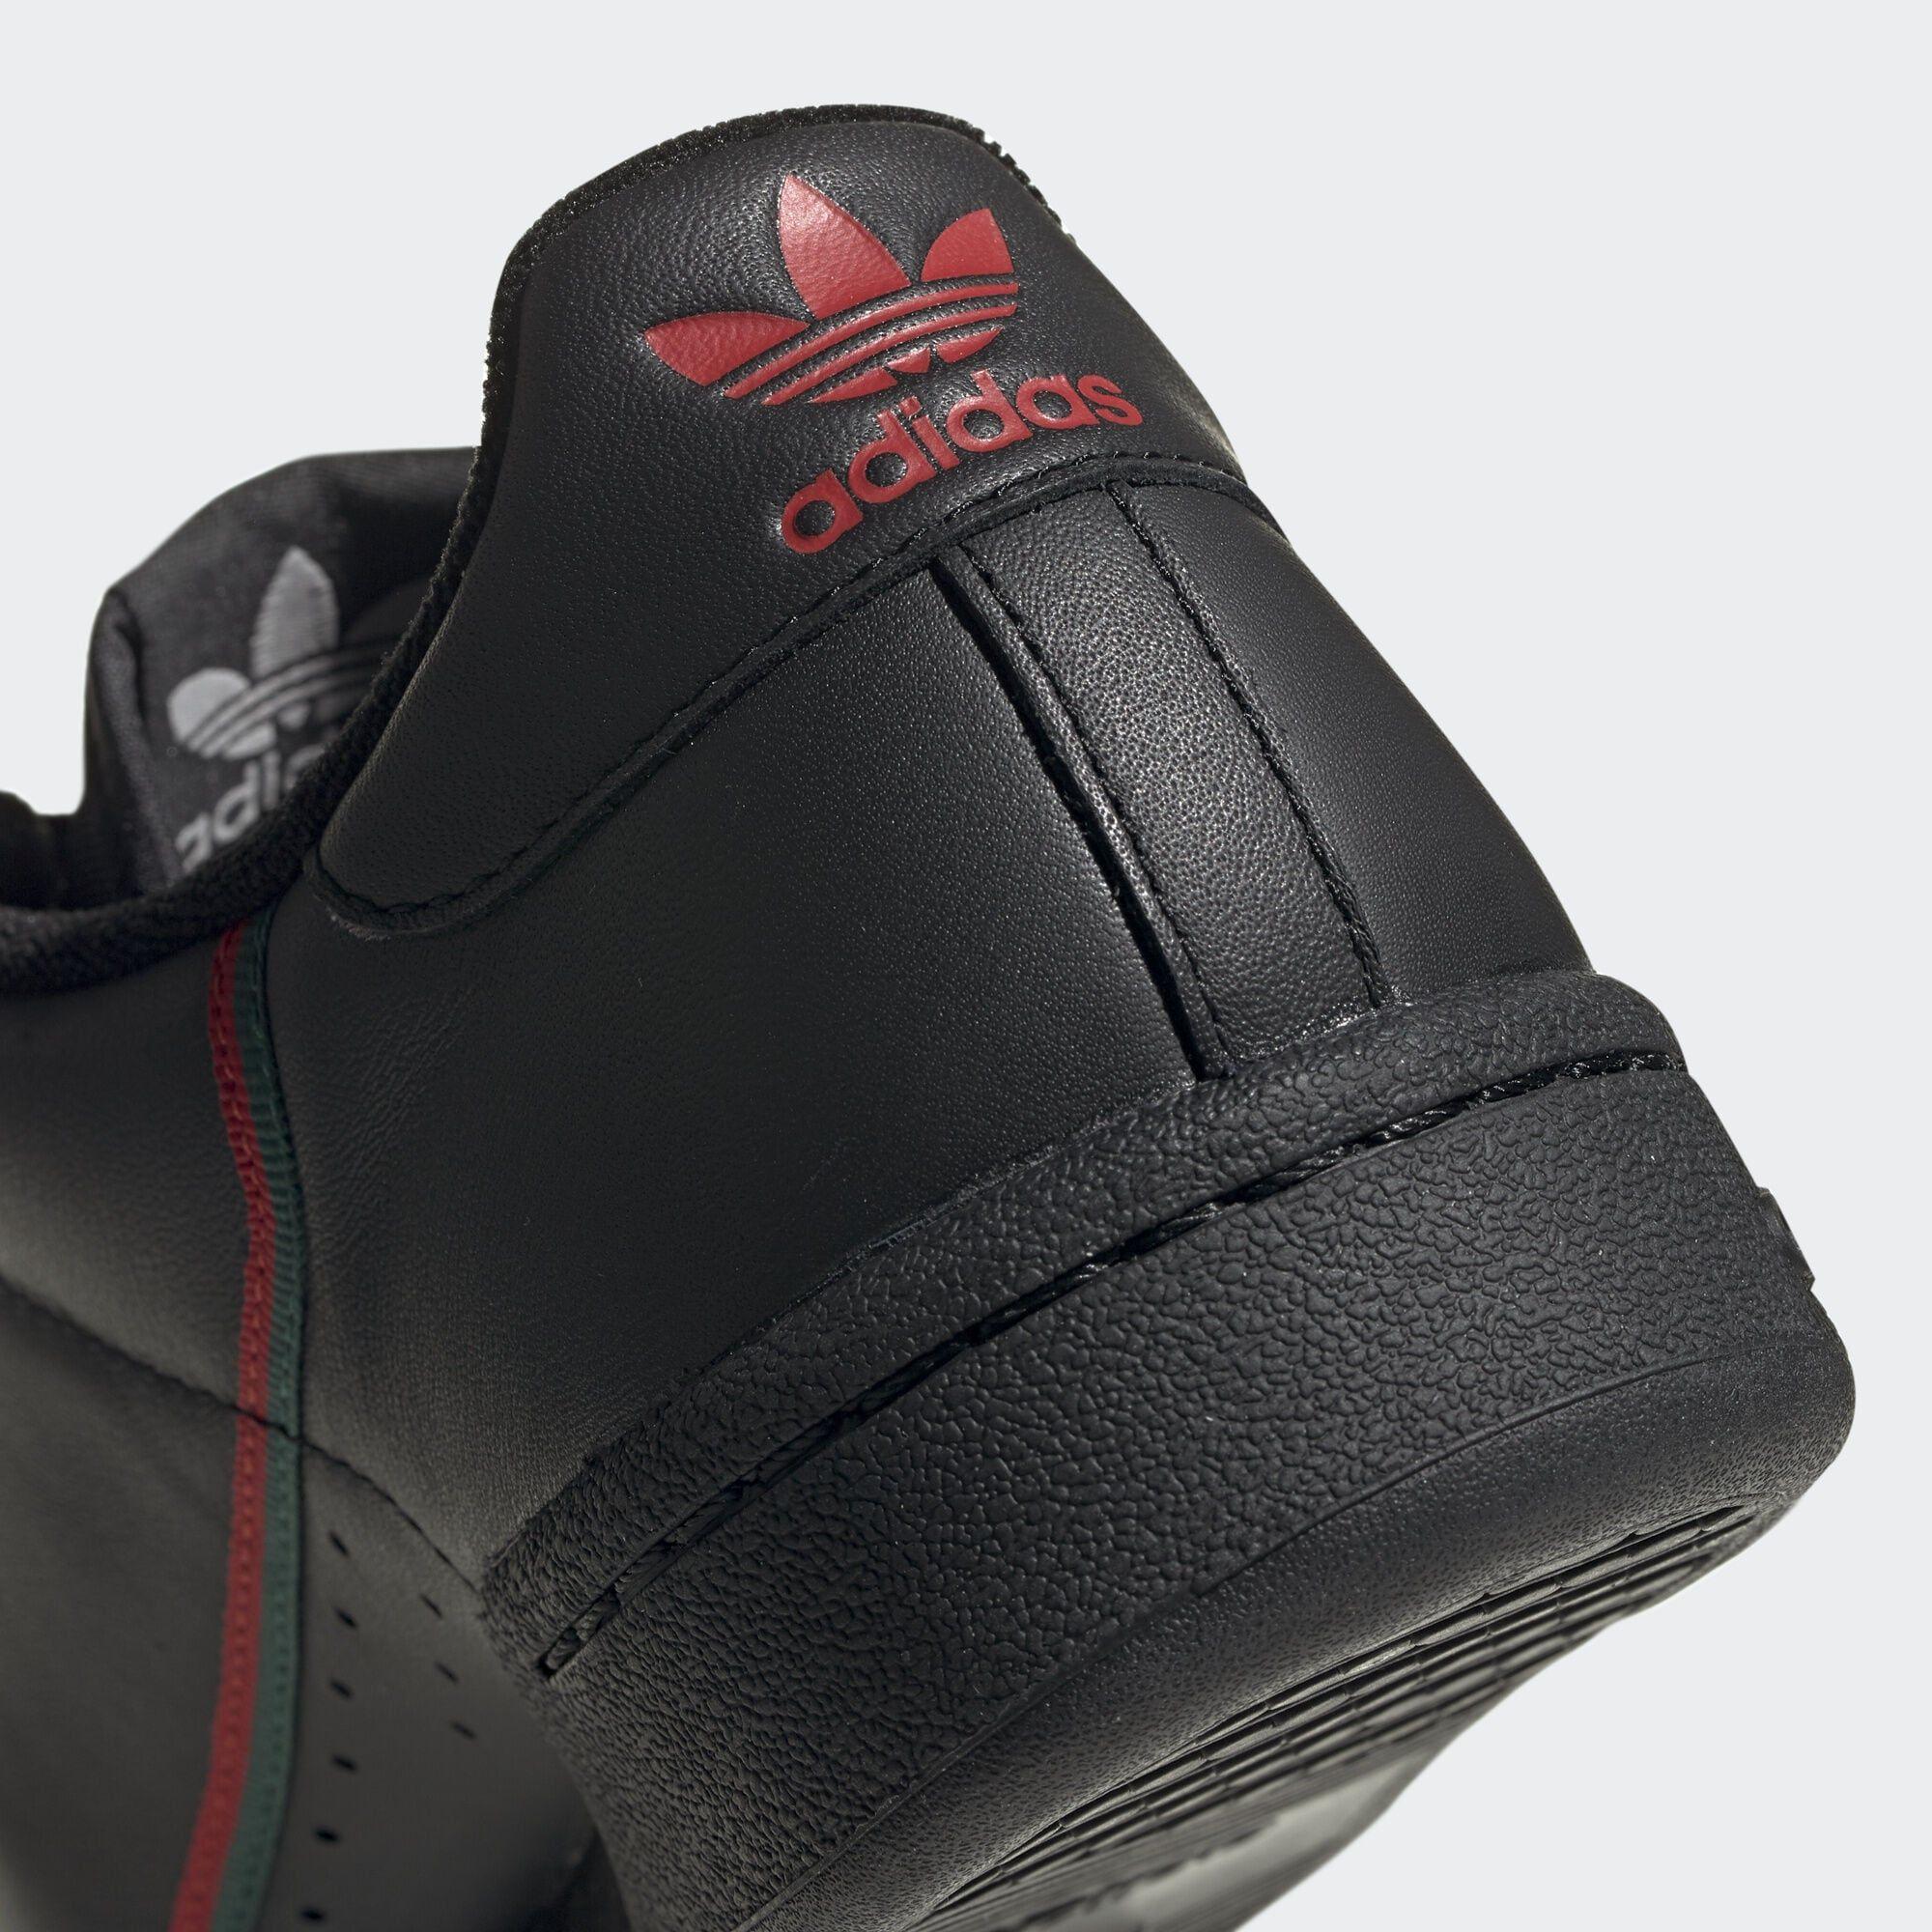 ADIDAS ORIGINALS Sneaker 'Continental 80' Herren, Grün Rot